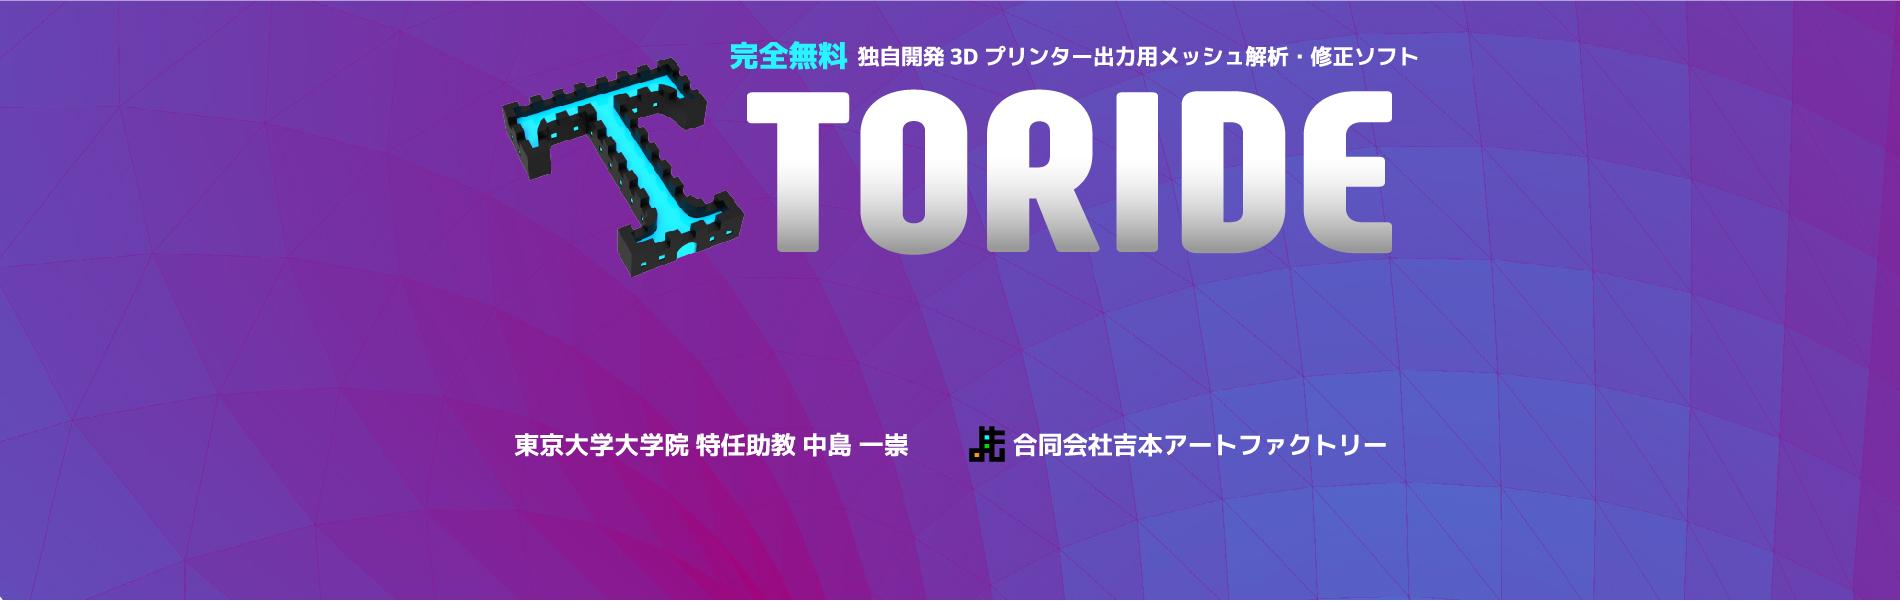 TORIDEホームページメイン01